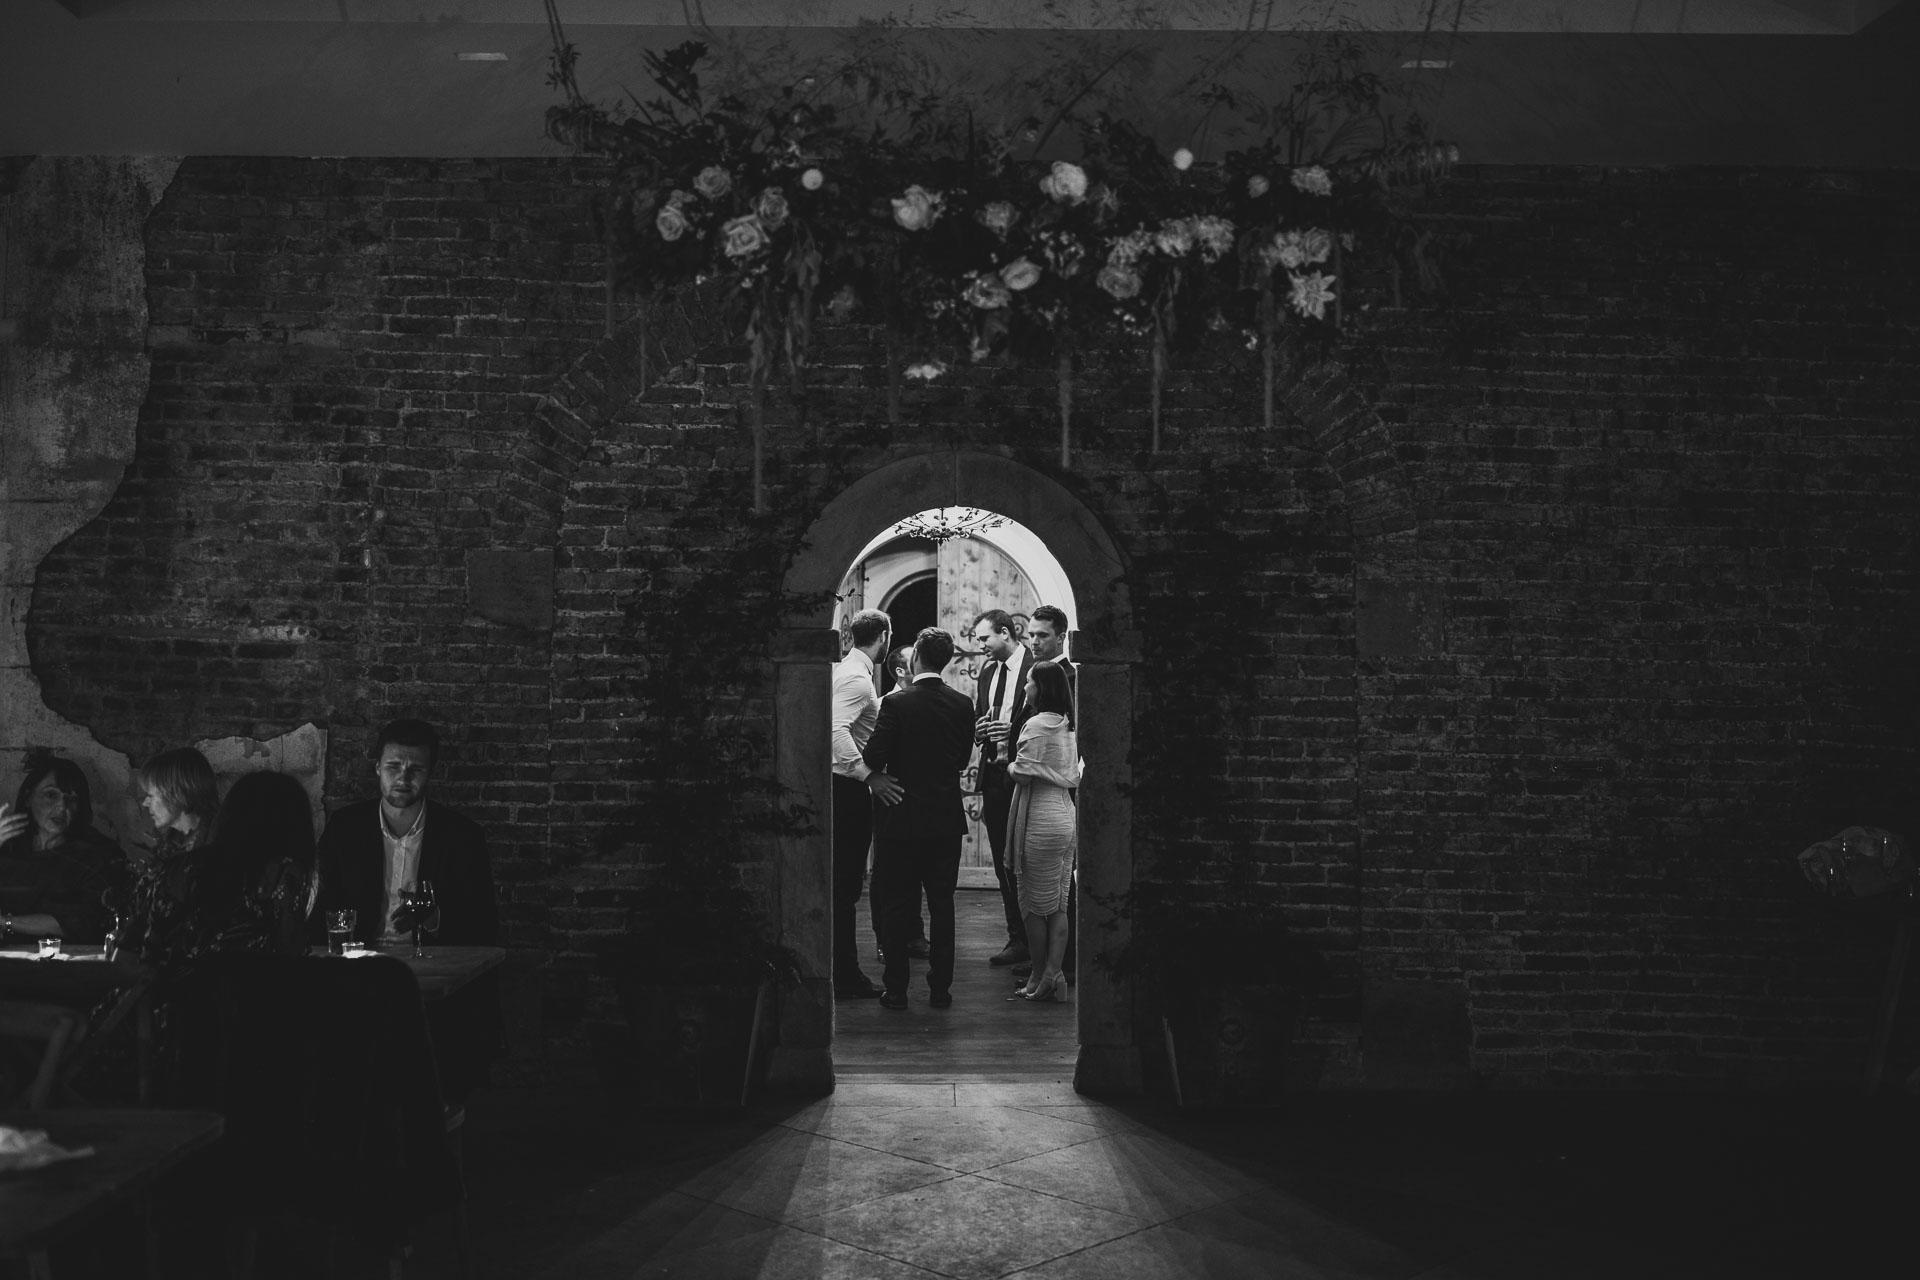 middleton_lodge_wedding_photographer-130.jpg